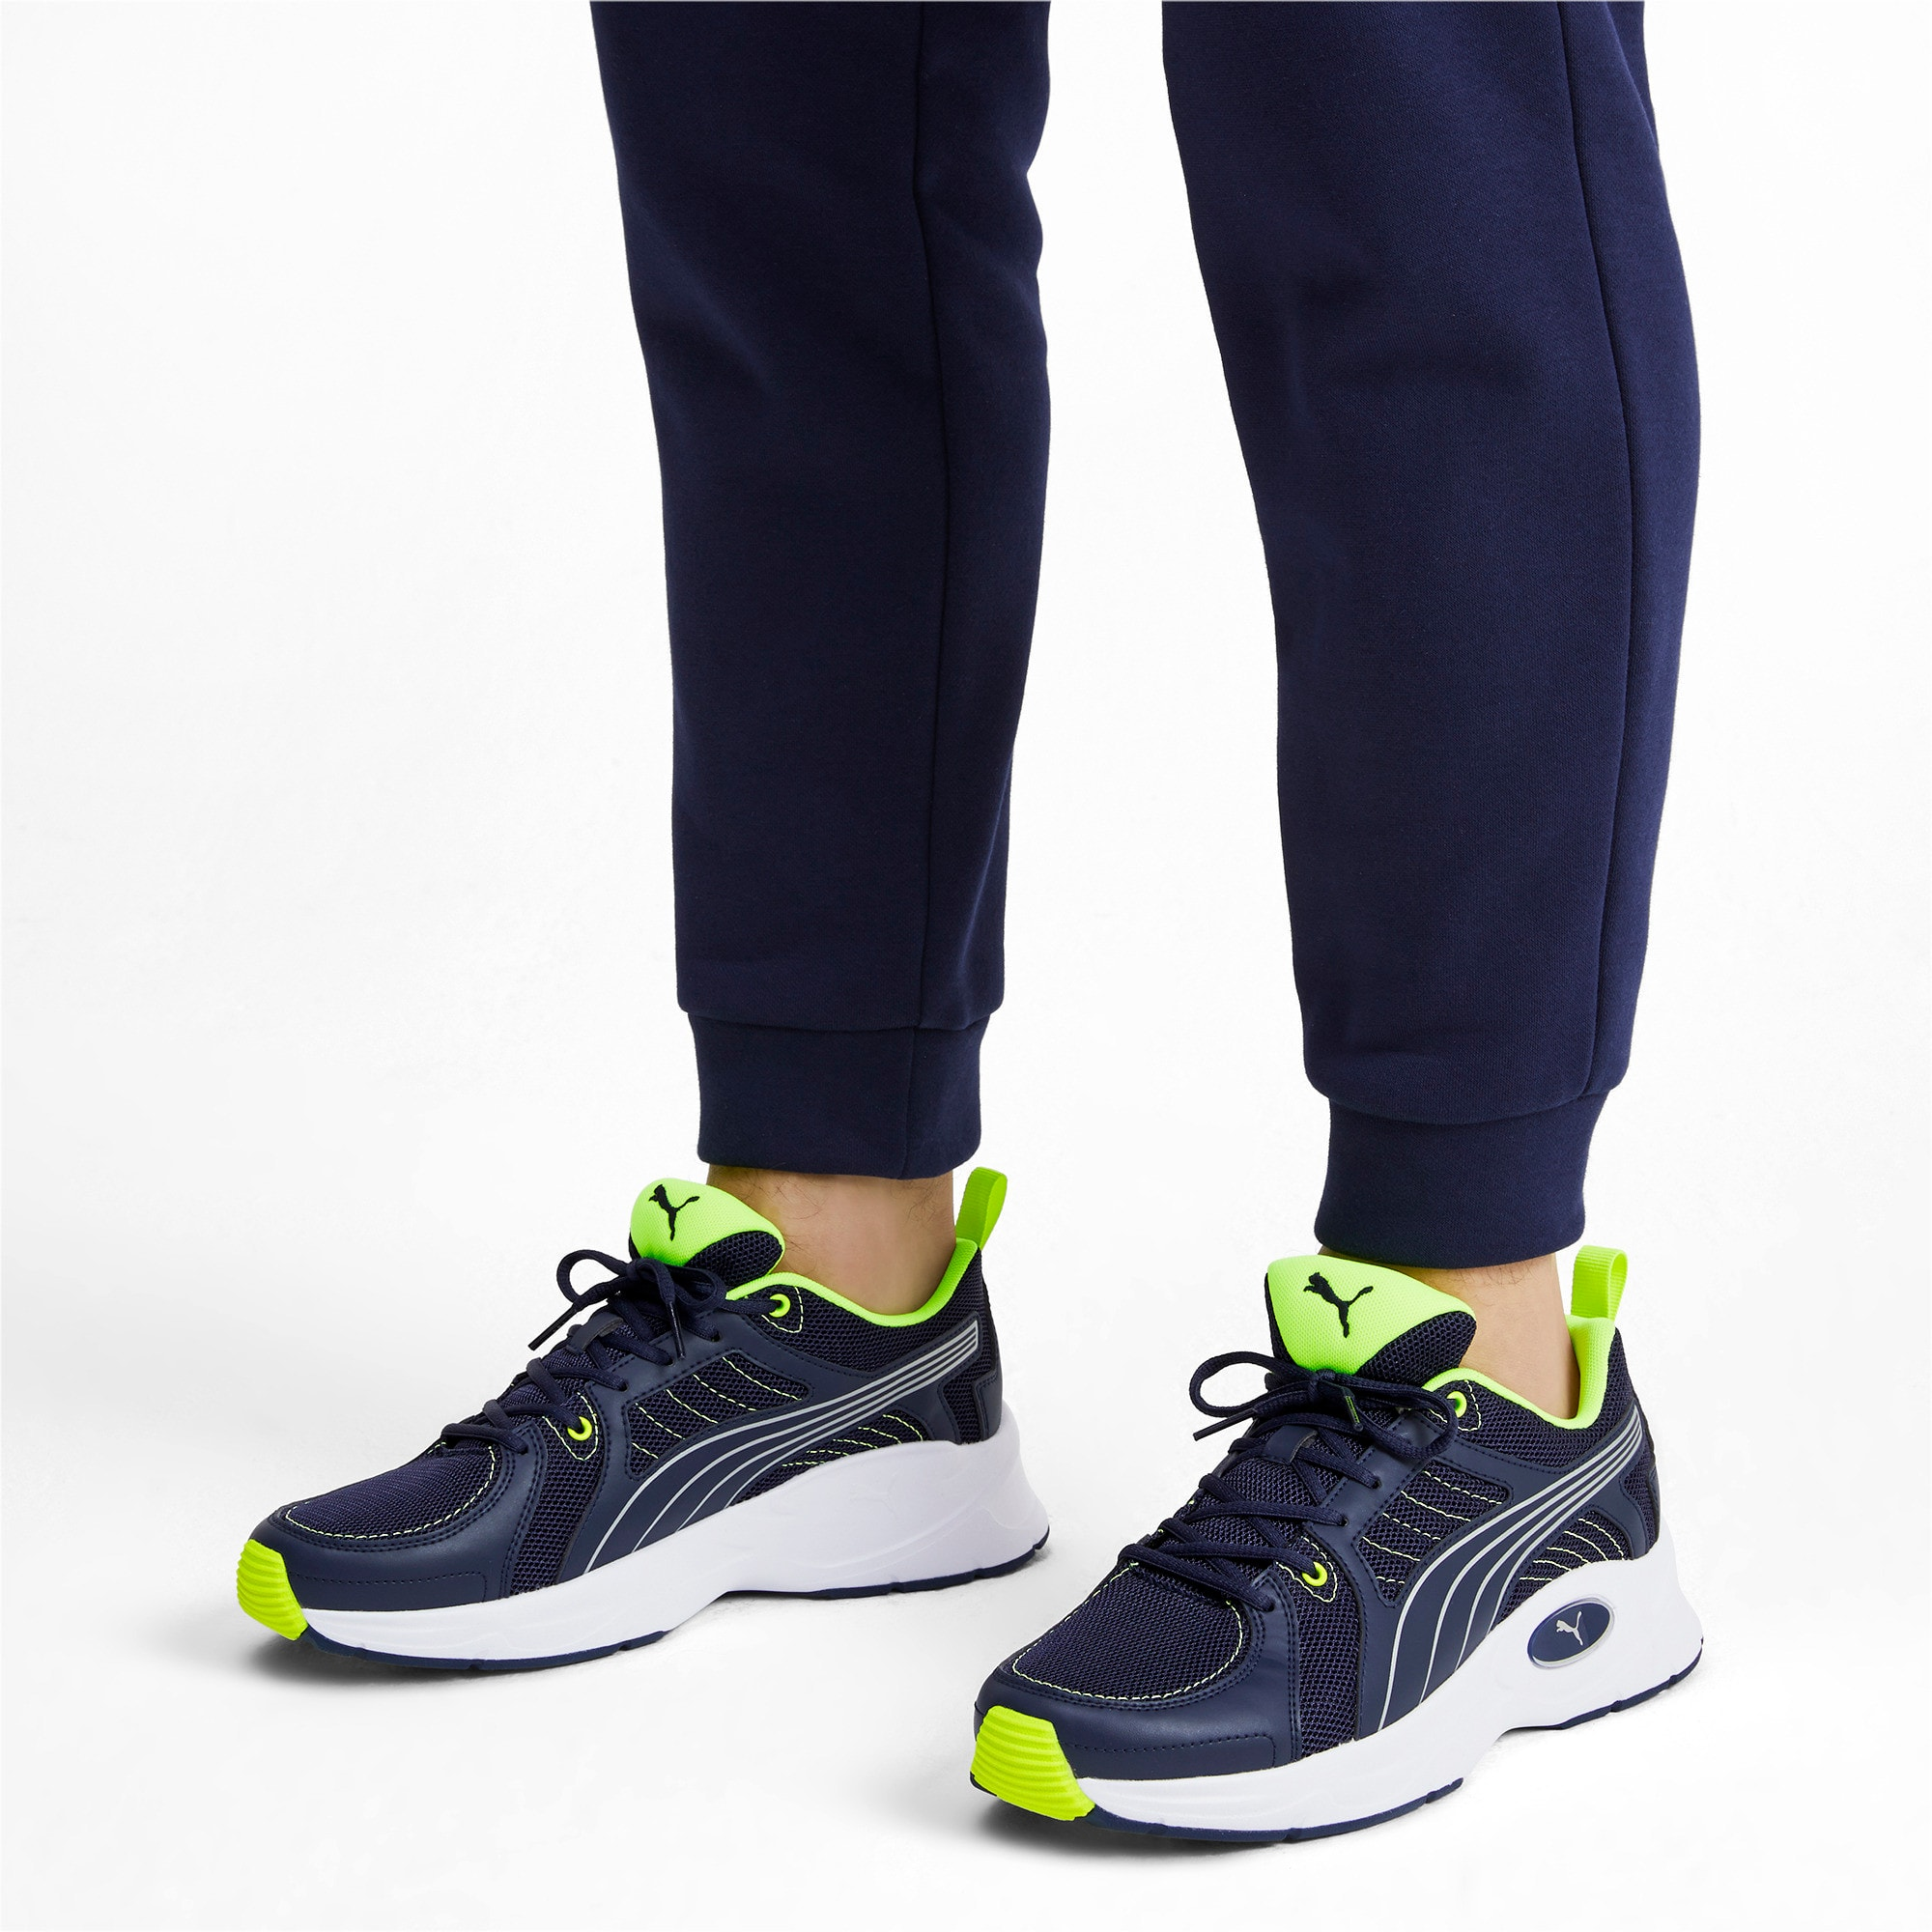 Thumbnail 3 of Nucleus Run Training Shoes, Peacoat-Puma Silver, medium-IND